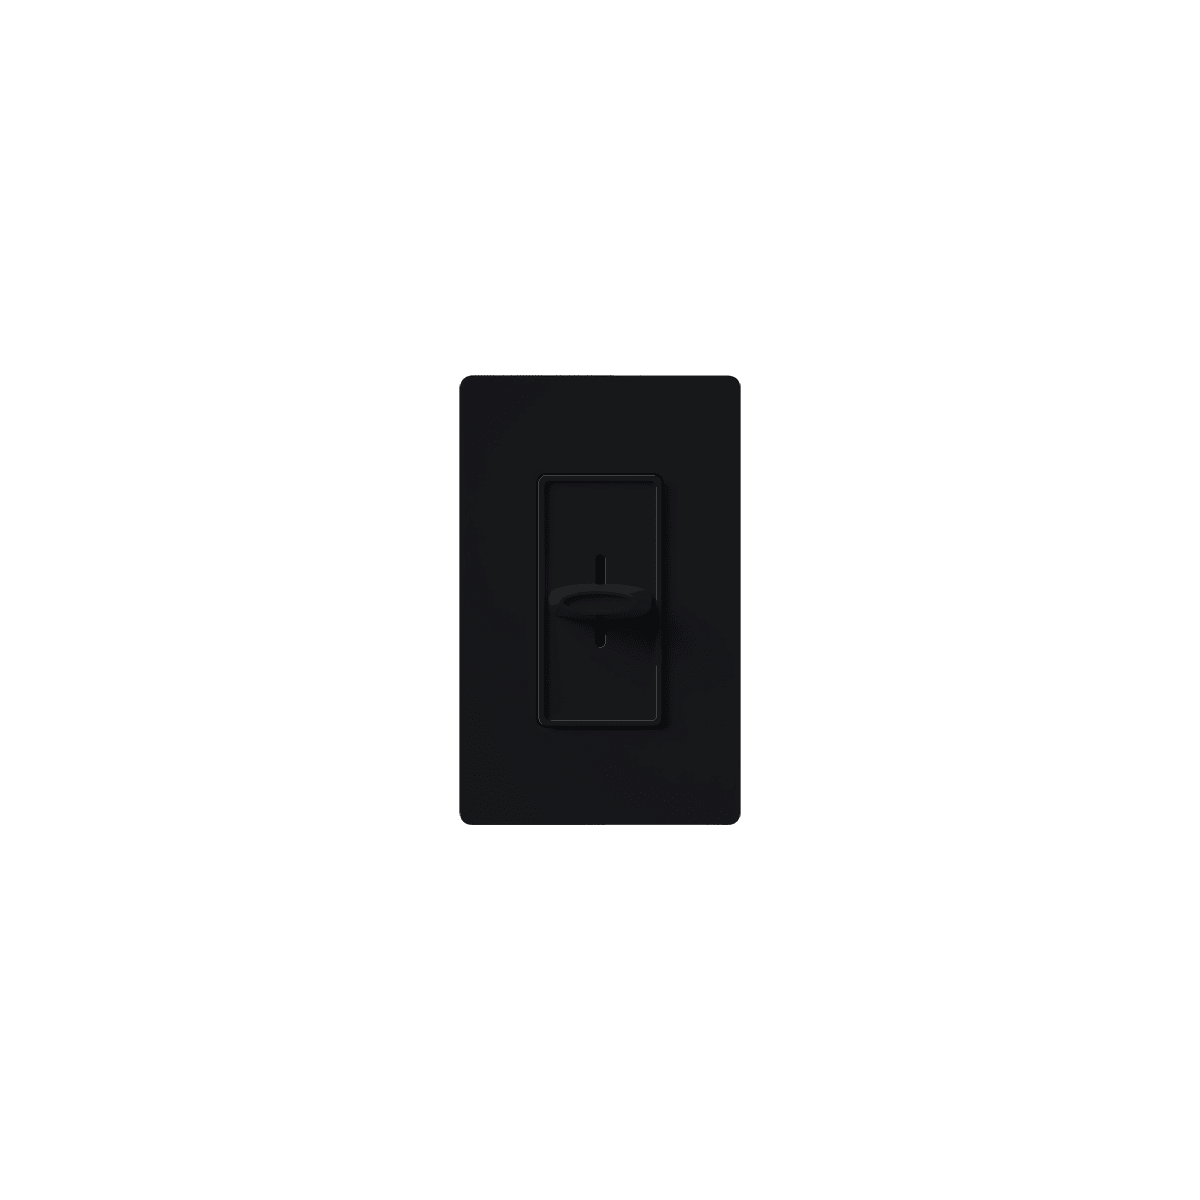 New Lutron Skylark SFS-5E-LA single pole fan control Light Almond 120 Volt